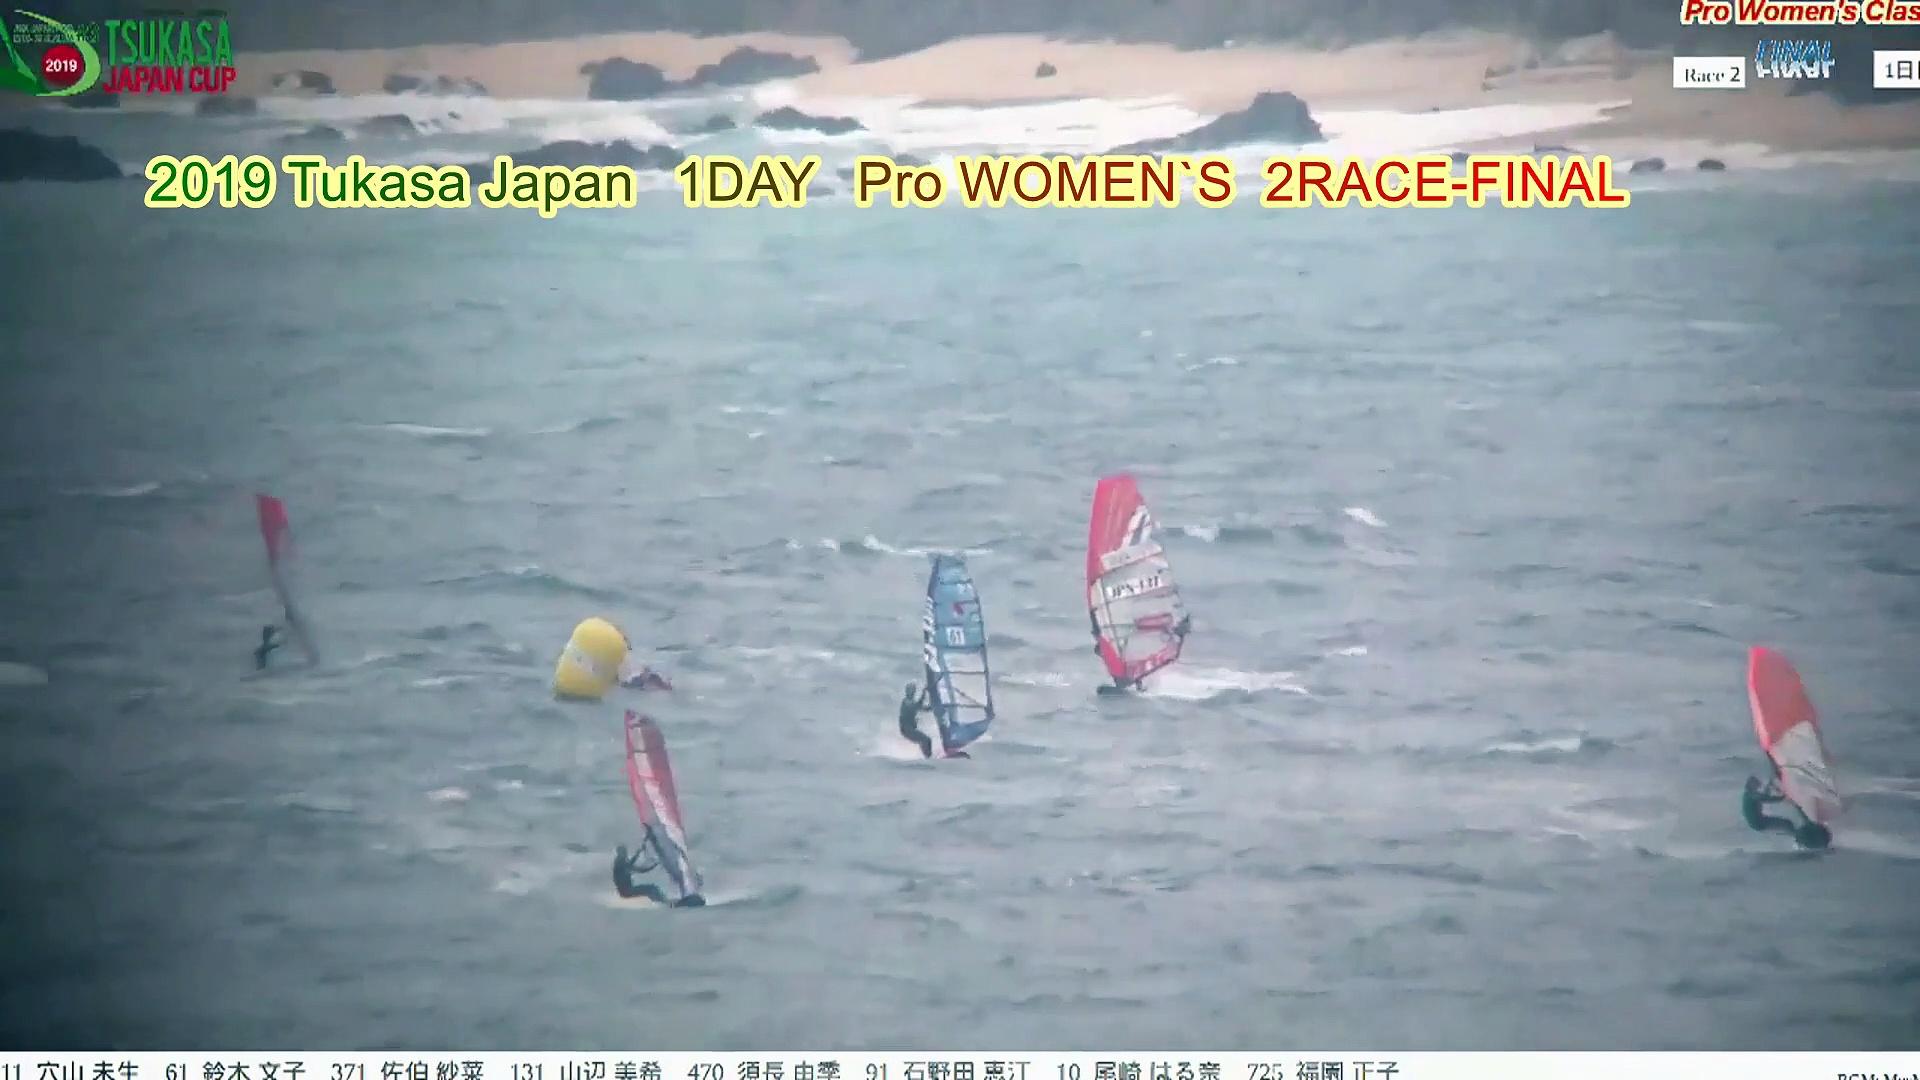 2019 Tukasa Japan CUP  Pro Women's  1DAY 2RACE-FINAL